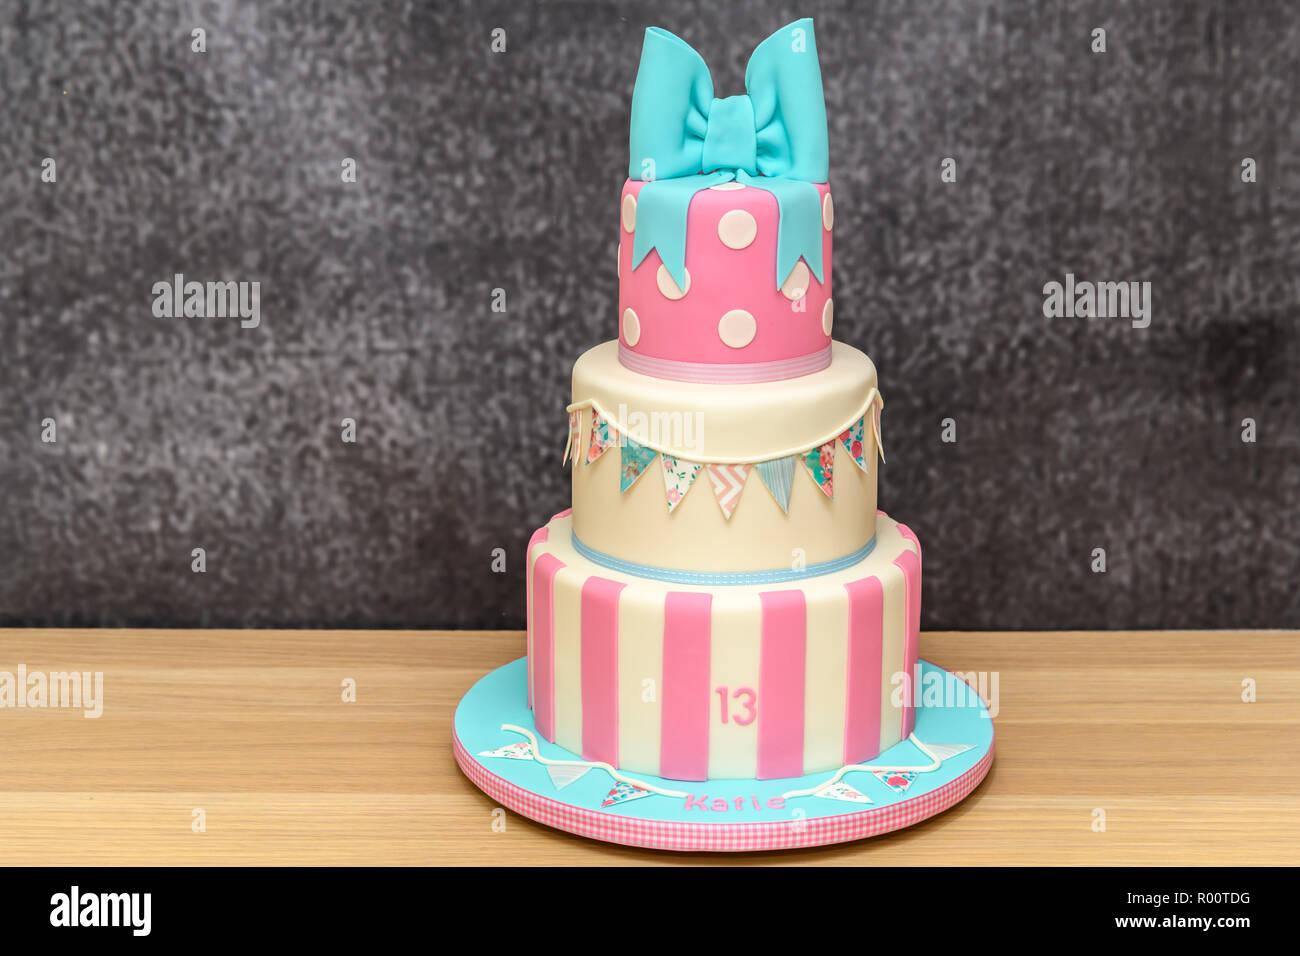 Hausgemachte Neuheit birthday cake Stockbild